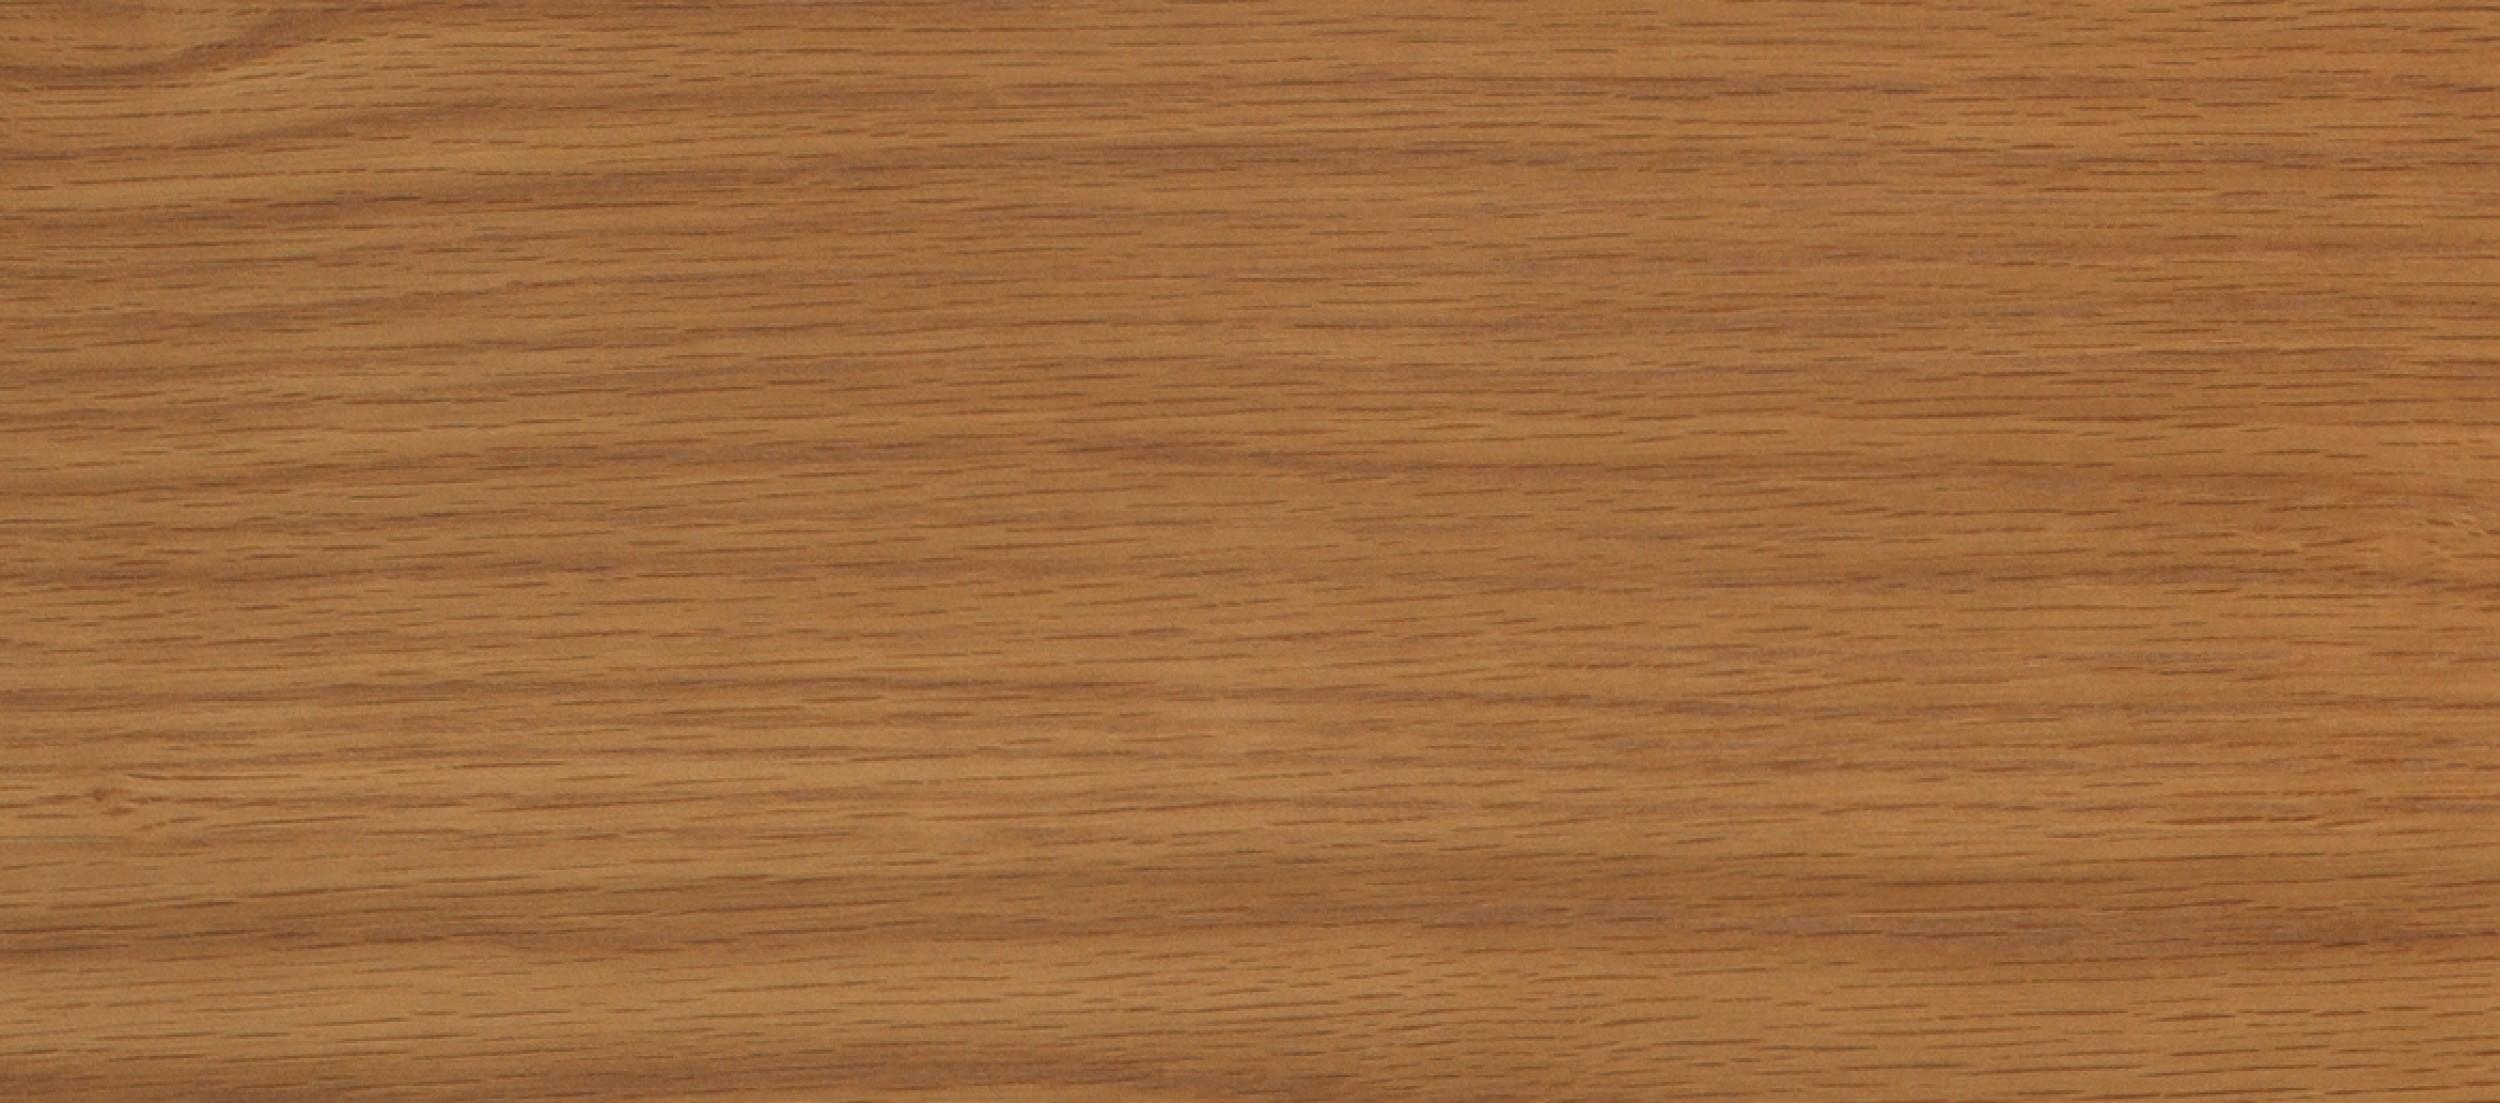 Rustic wood grain rustic wood furniture grain - Rustic Oak Open Coffee Table